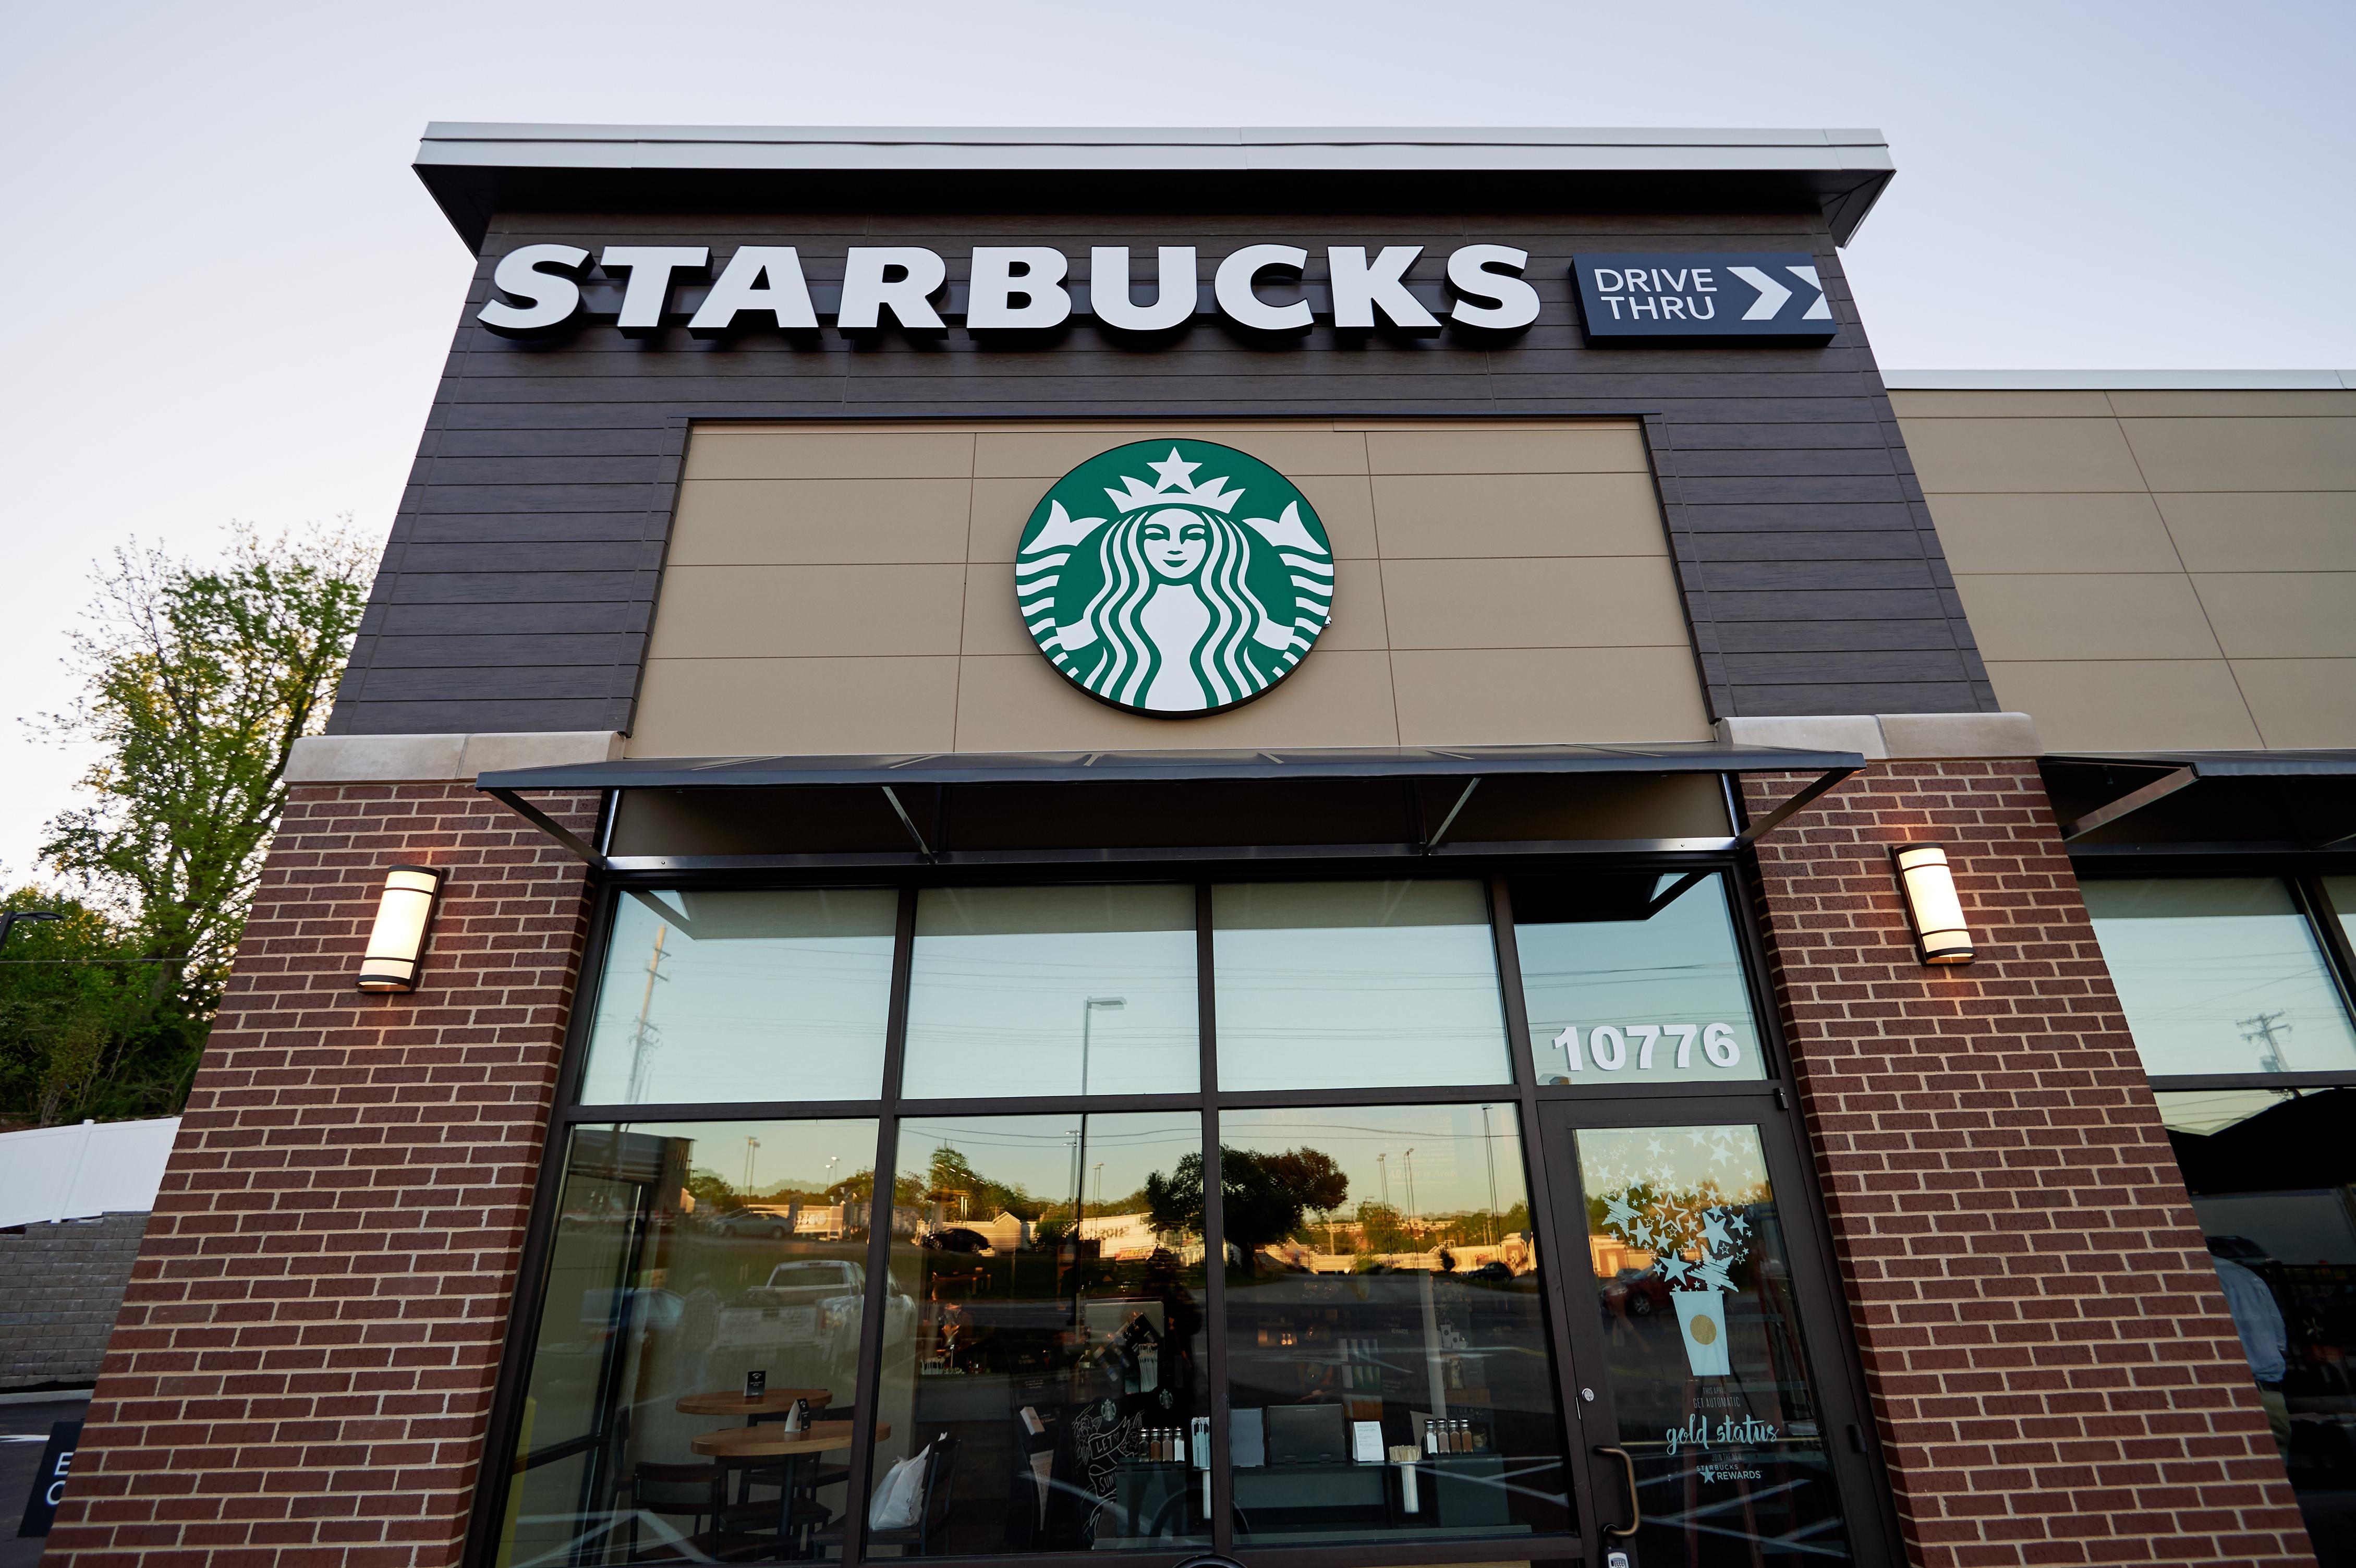 Exterior of the Ferguson Starbucks location on April 28, 2016 in Ferguson, Missouri. Photo: Michael Thomas for Starbucks Coffee Company.